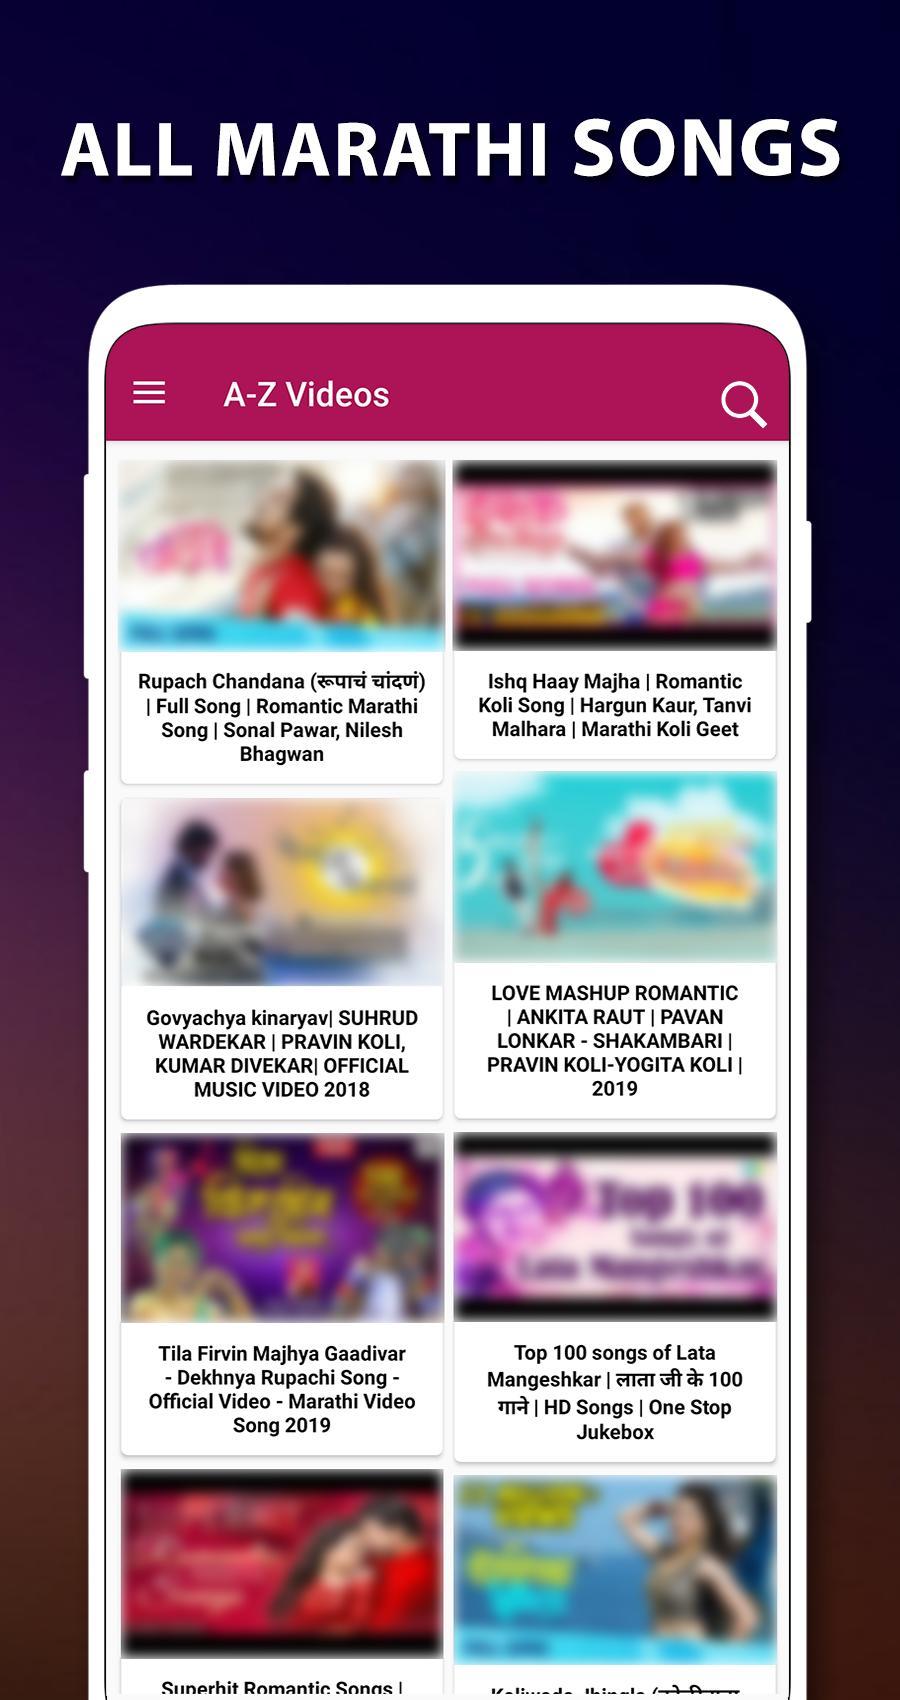 Marathi Video: Marathi Songs, Gana: मराठी गाणी for Android - APK Download